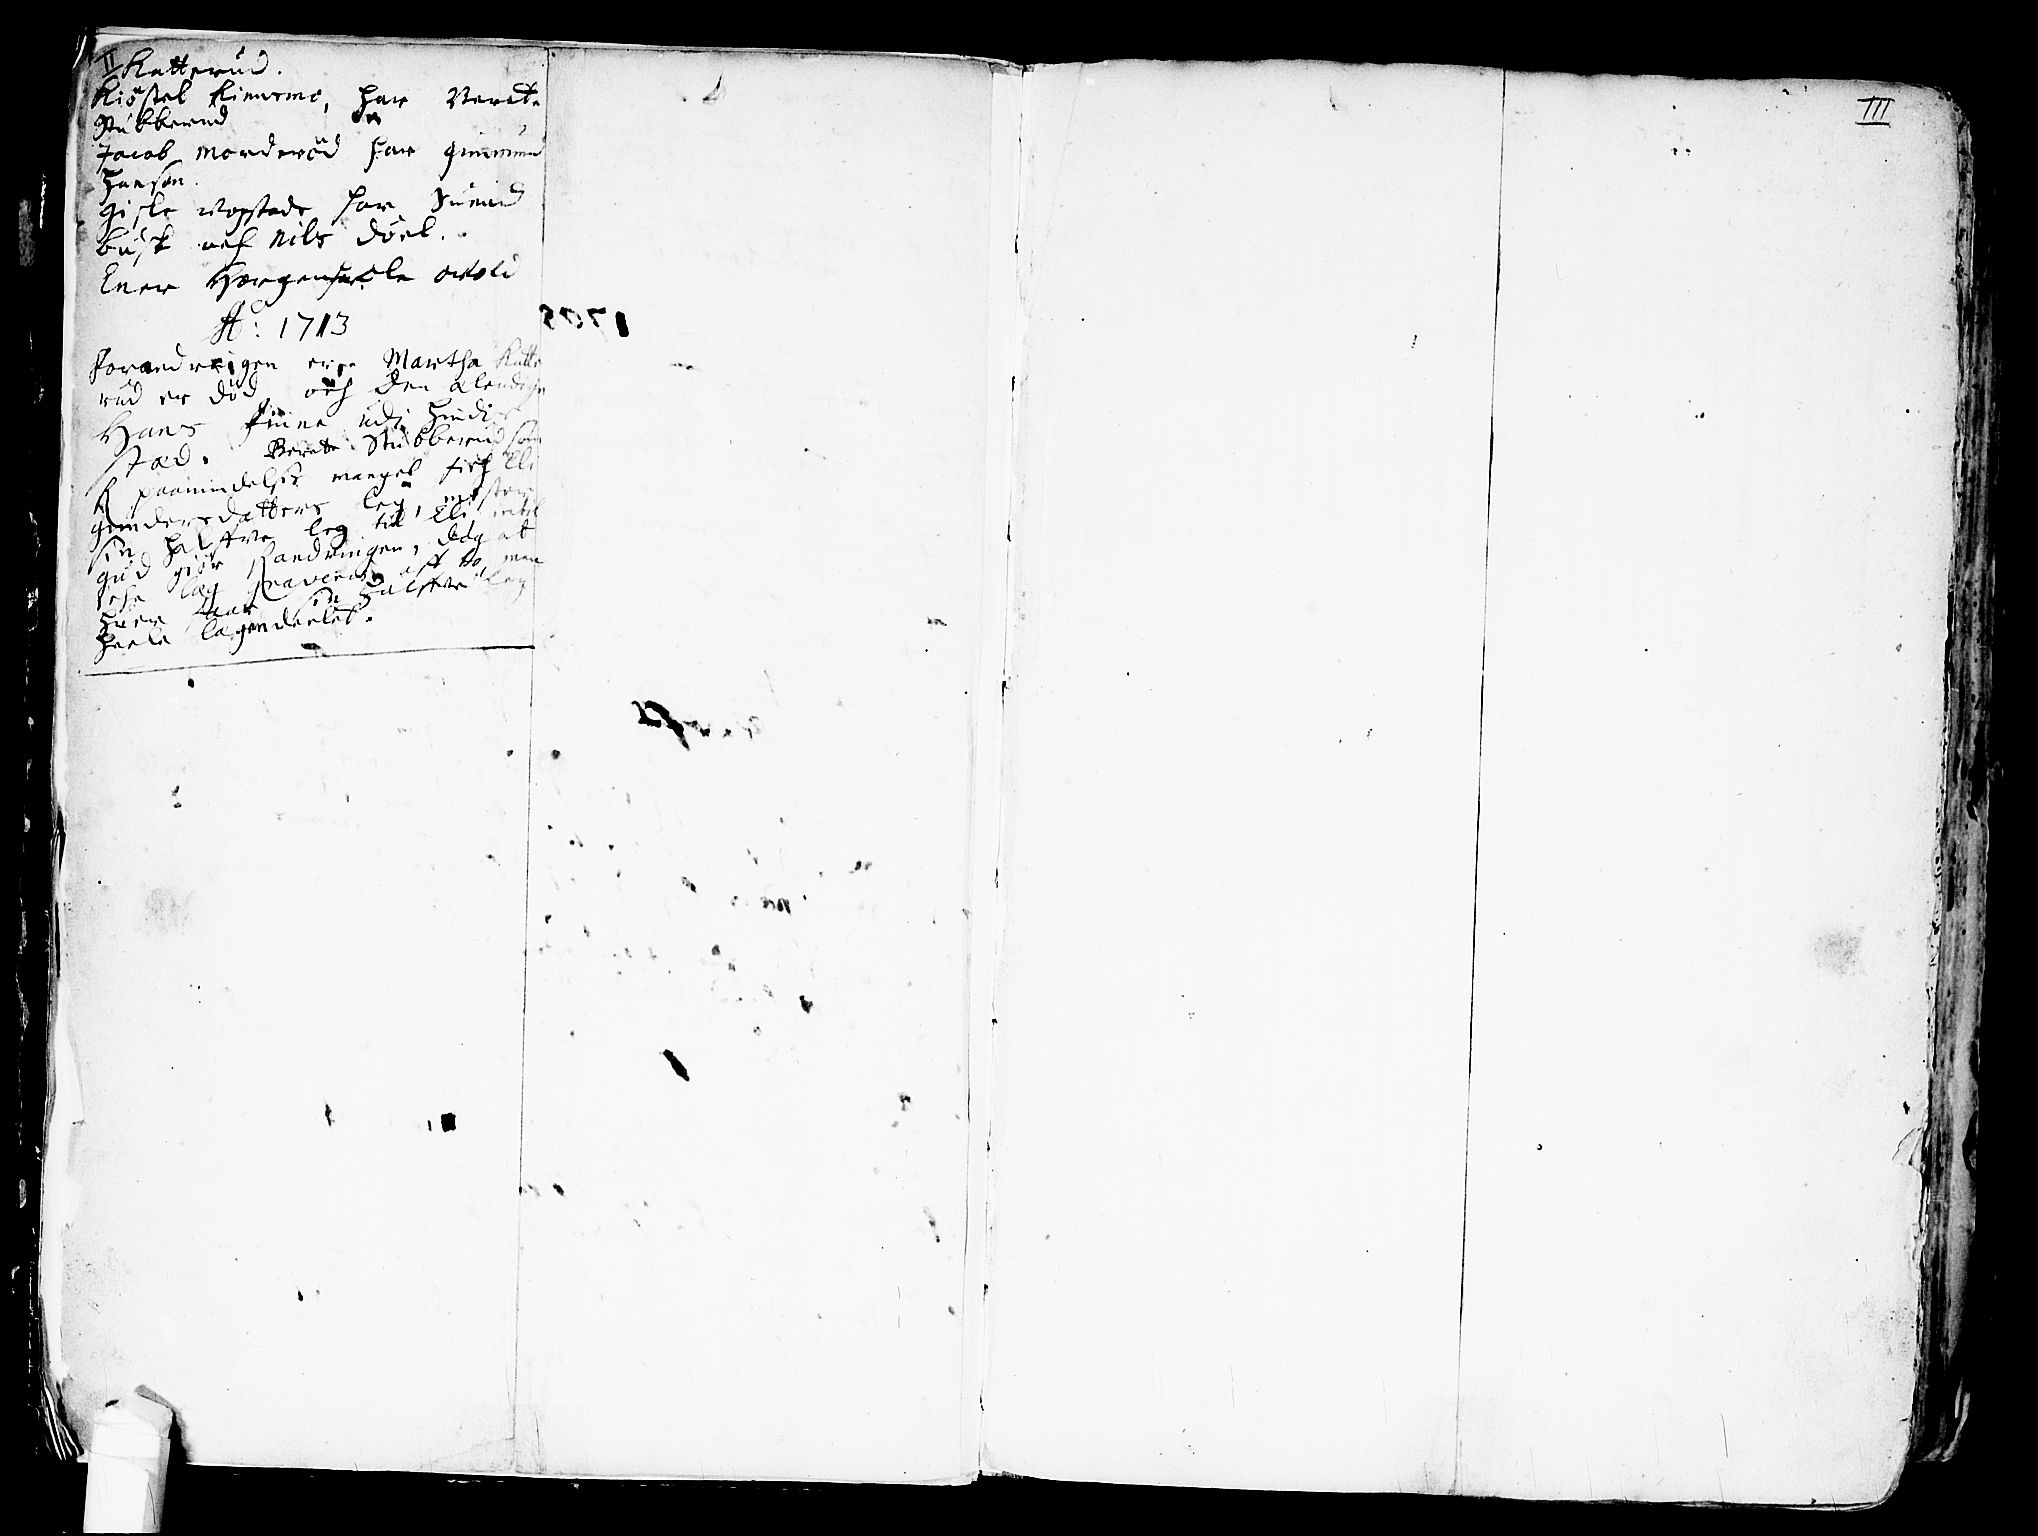 SAO, Nes prestekontor Kirkebøker, F/Fa/L0001: Ministerialbok nr. I 1, 1689-1716, s. II